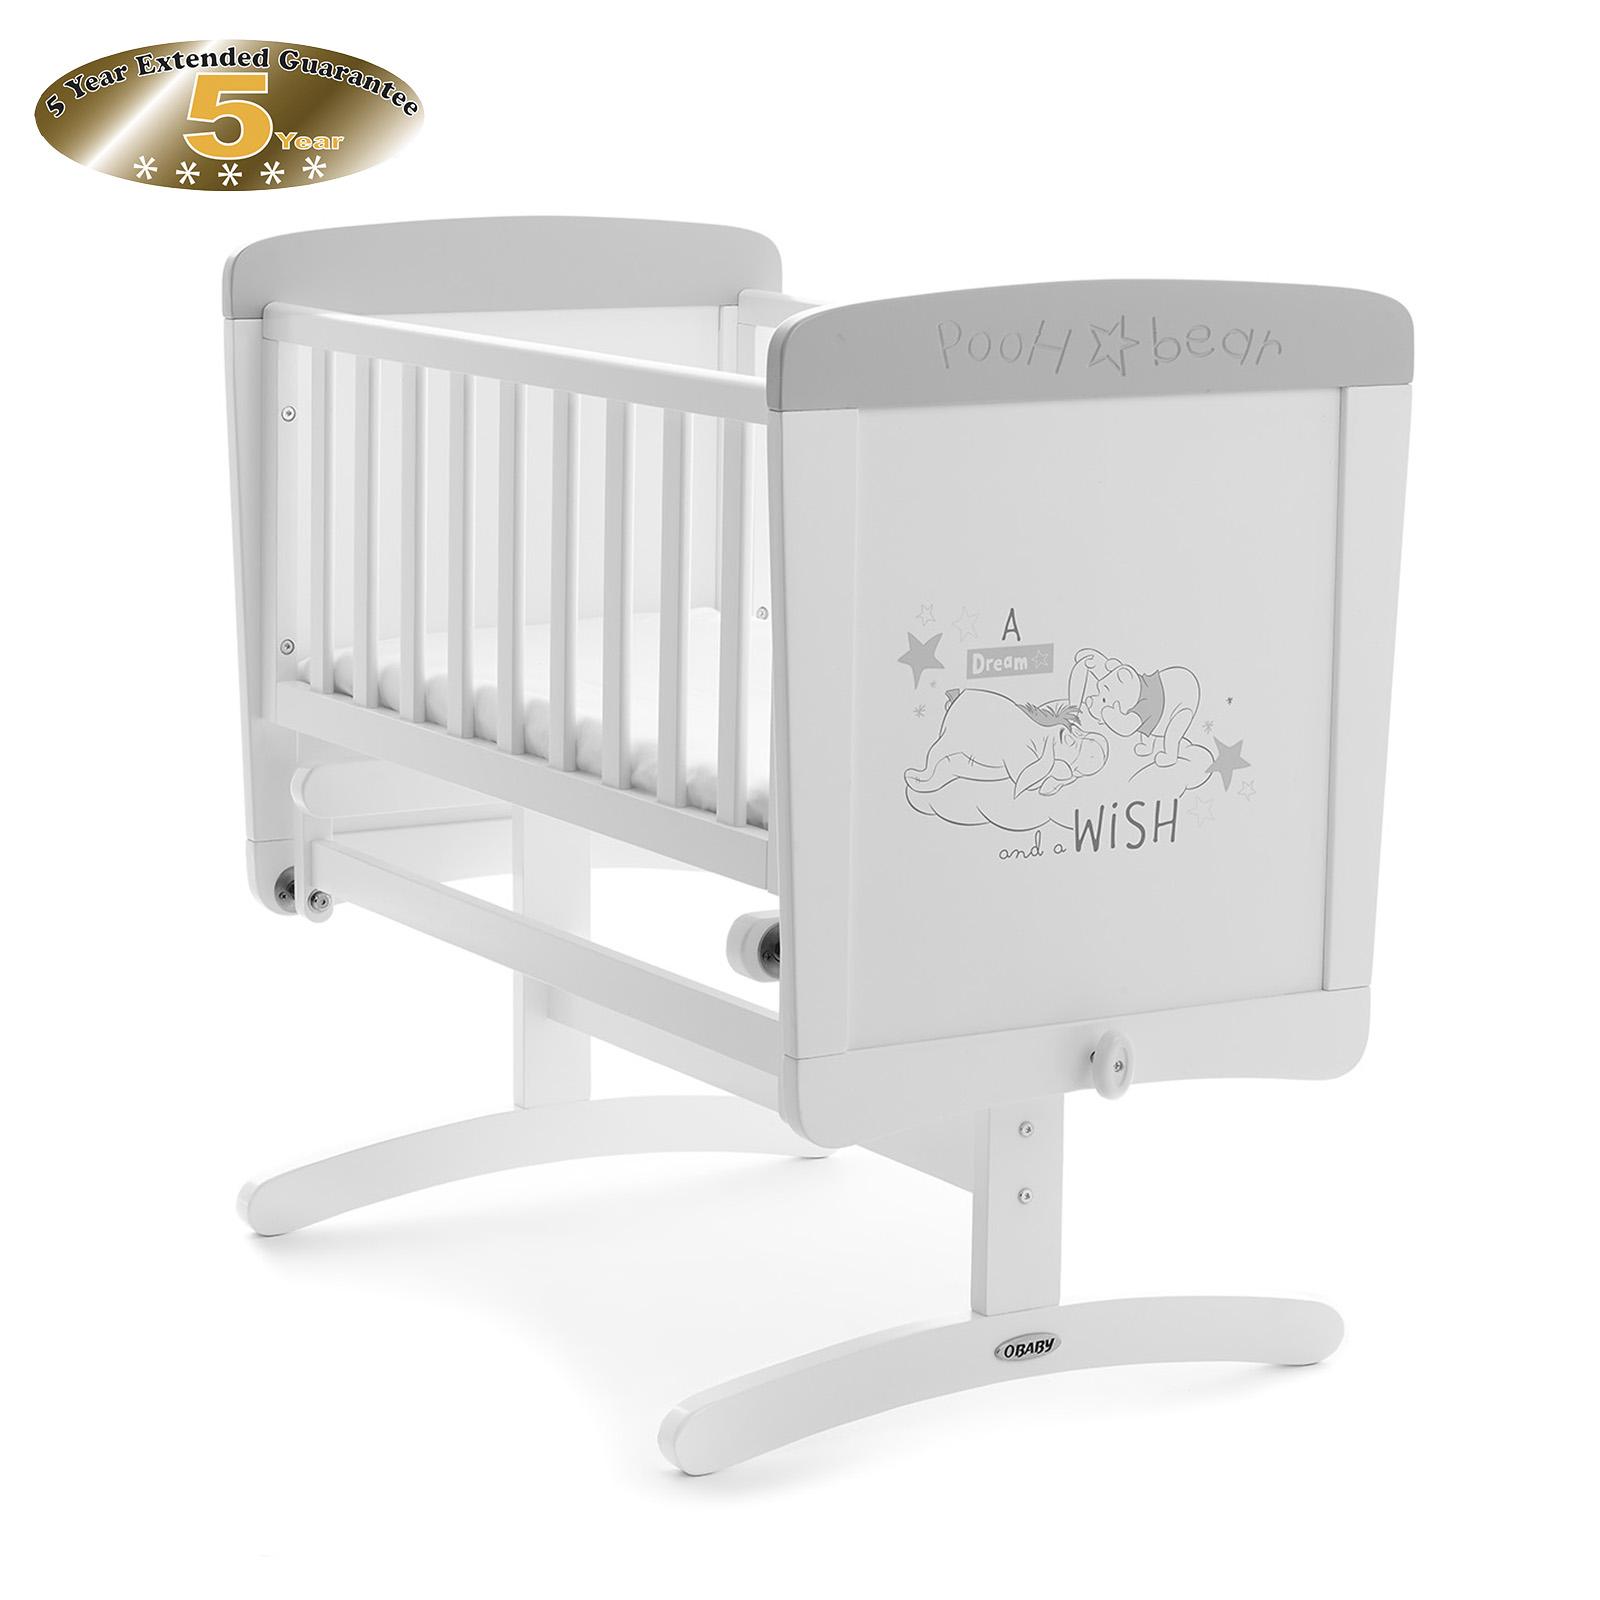 obaby disney pooh dreams u0026 wishes gliding crib white with grey trim